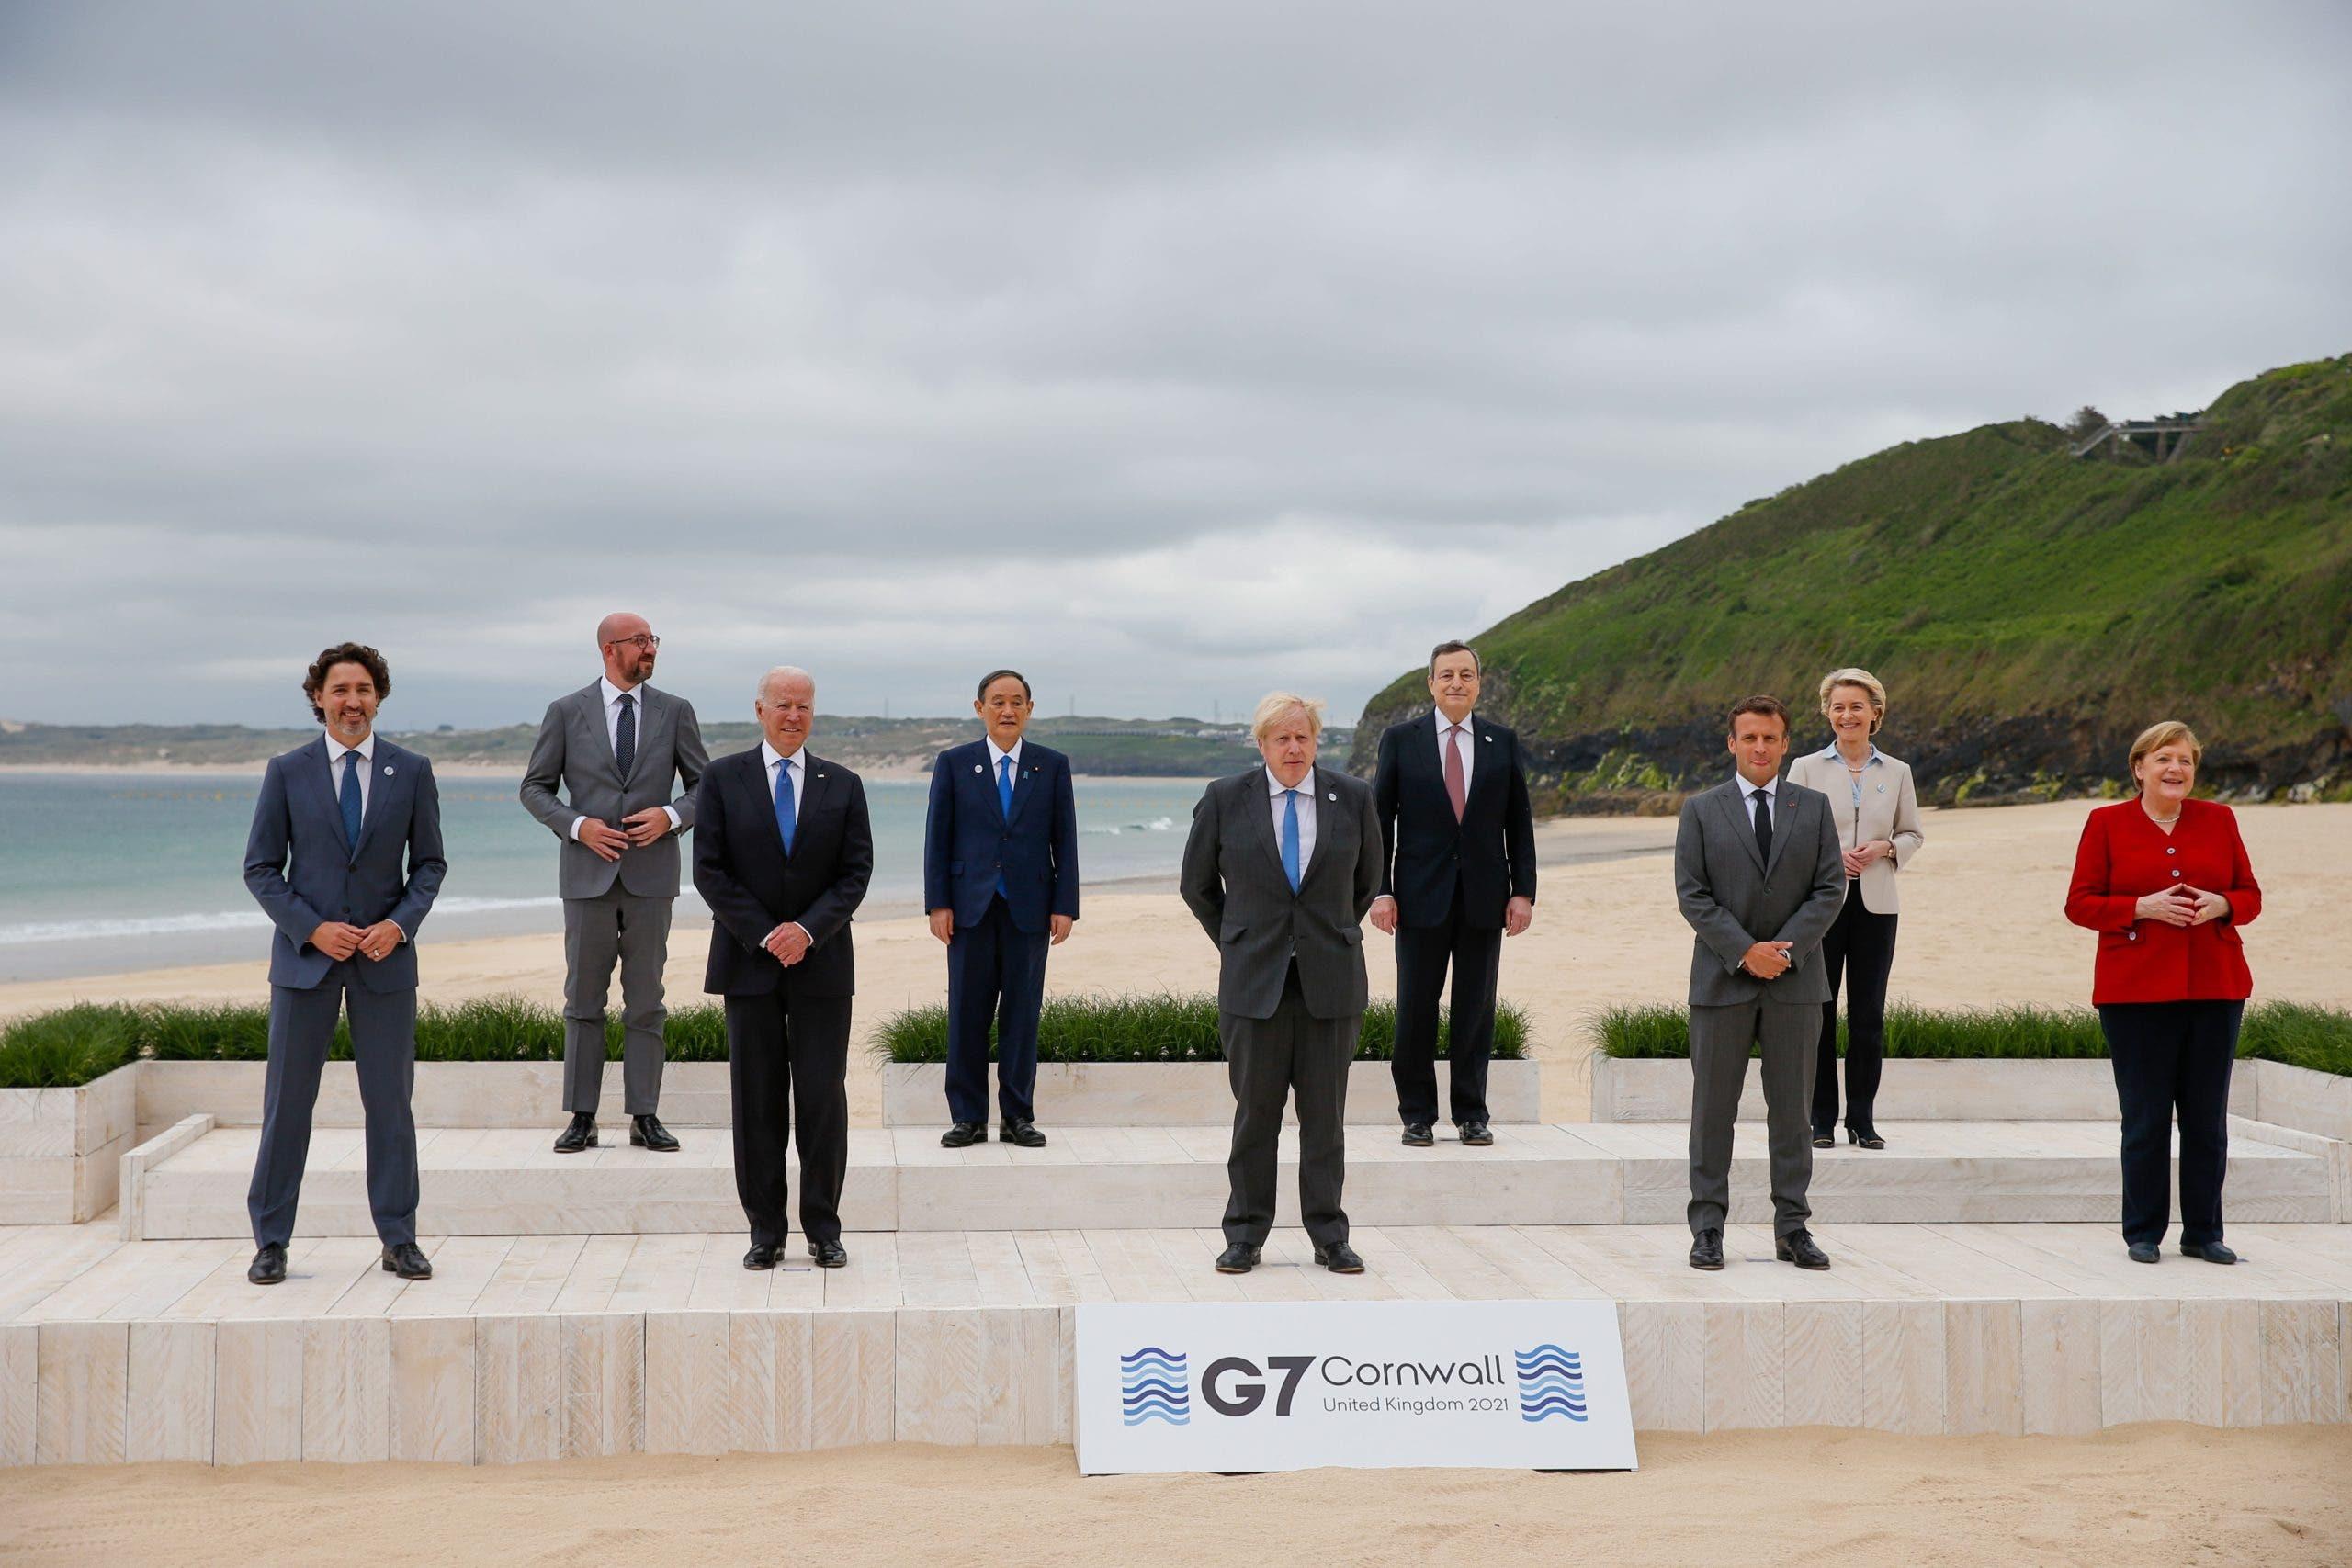 G7 inicia cumbre prometiendo donar vacunas contra COVID-19